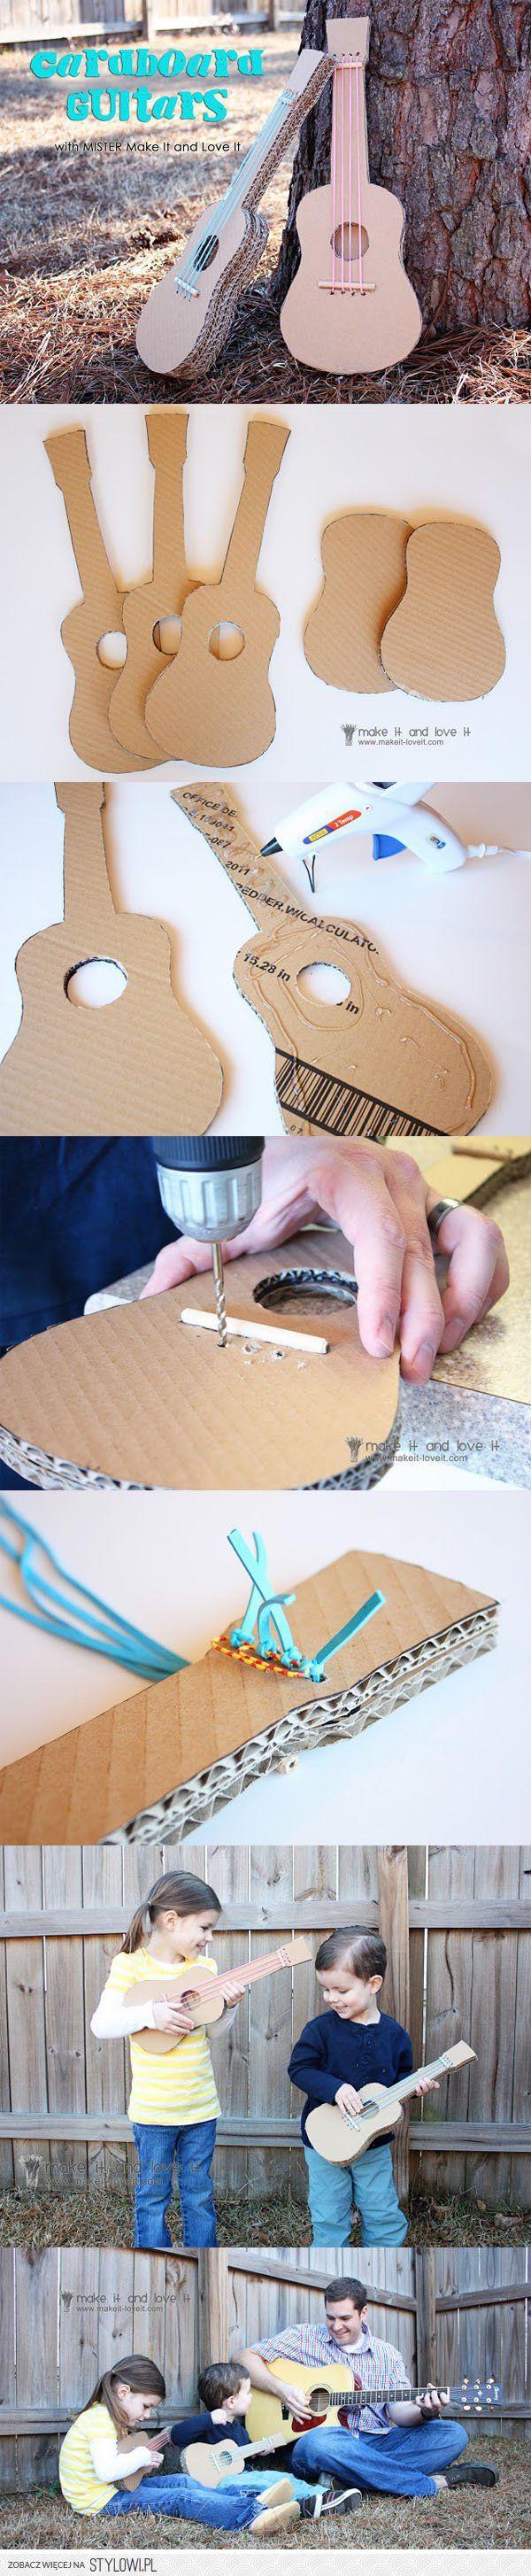 DIY Cardboard Guitar DIY Projects | UsefulDIY.com na Stylowi.pl